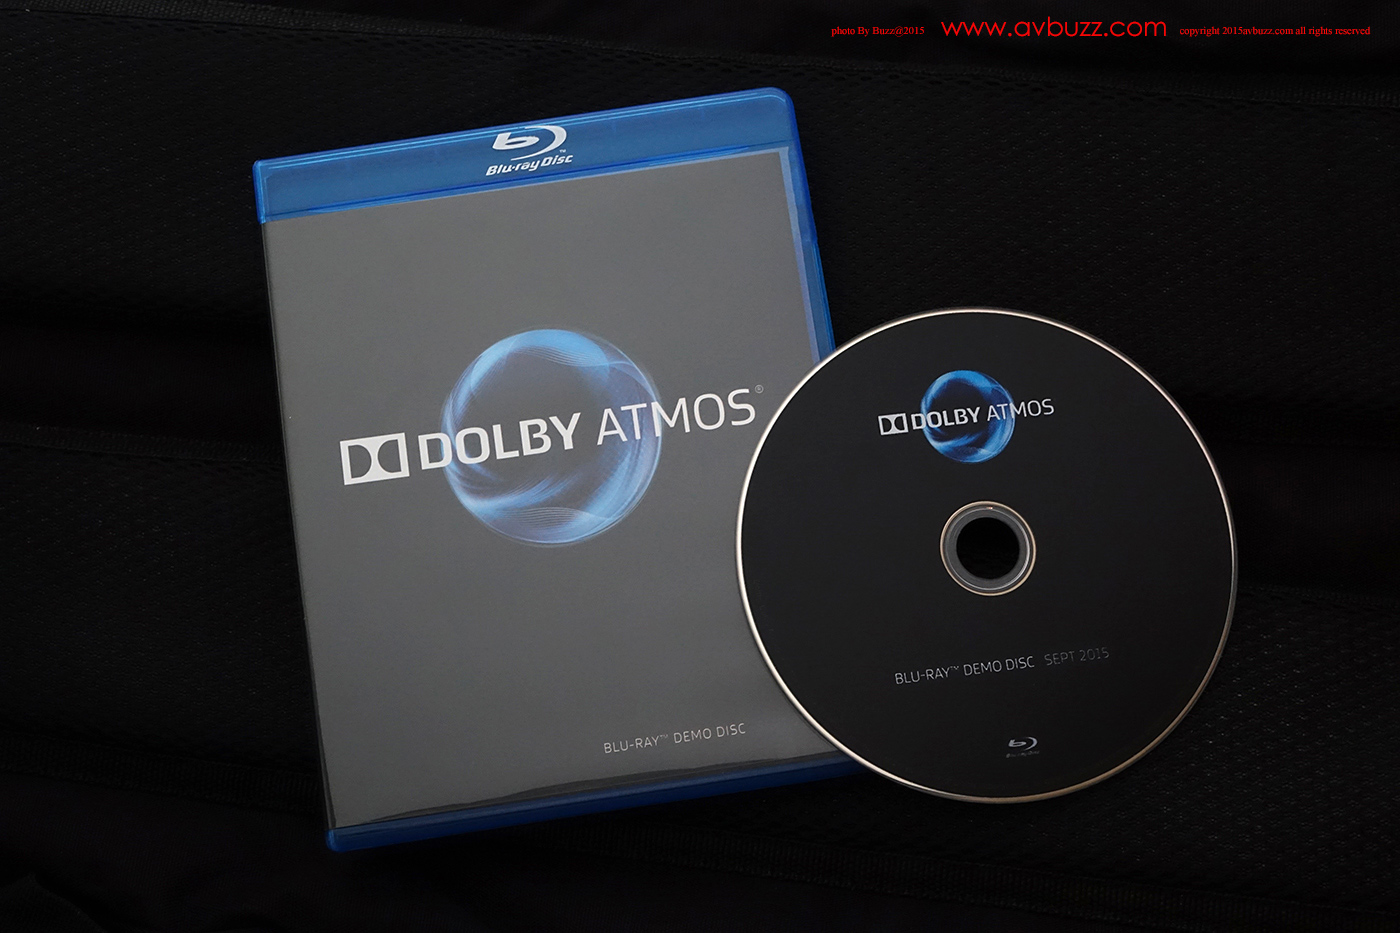 dolby atmos blu ray demo disc sept 2015. Black Bedroom Furniture Sets. Home Design Ideas